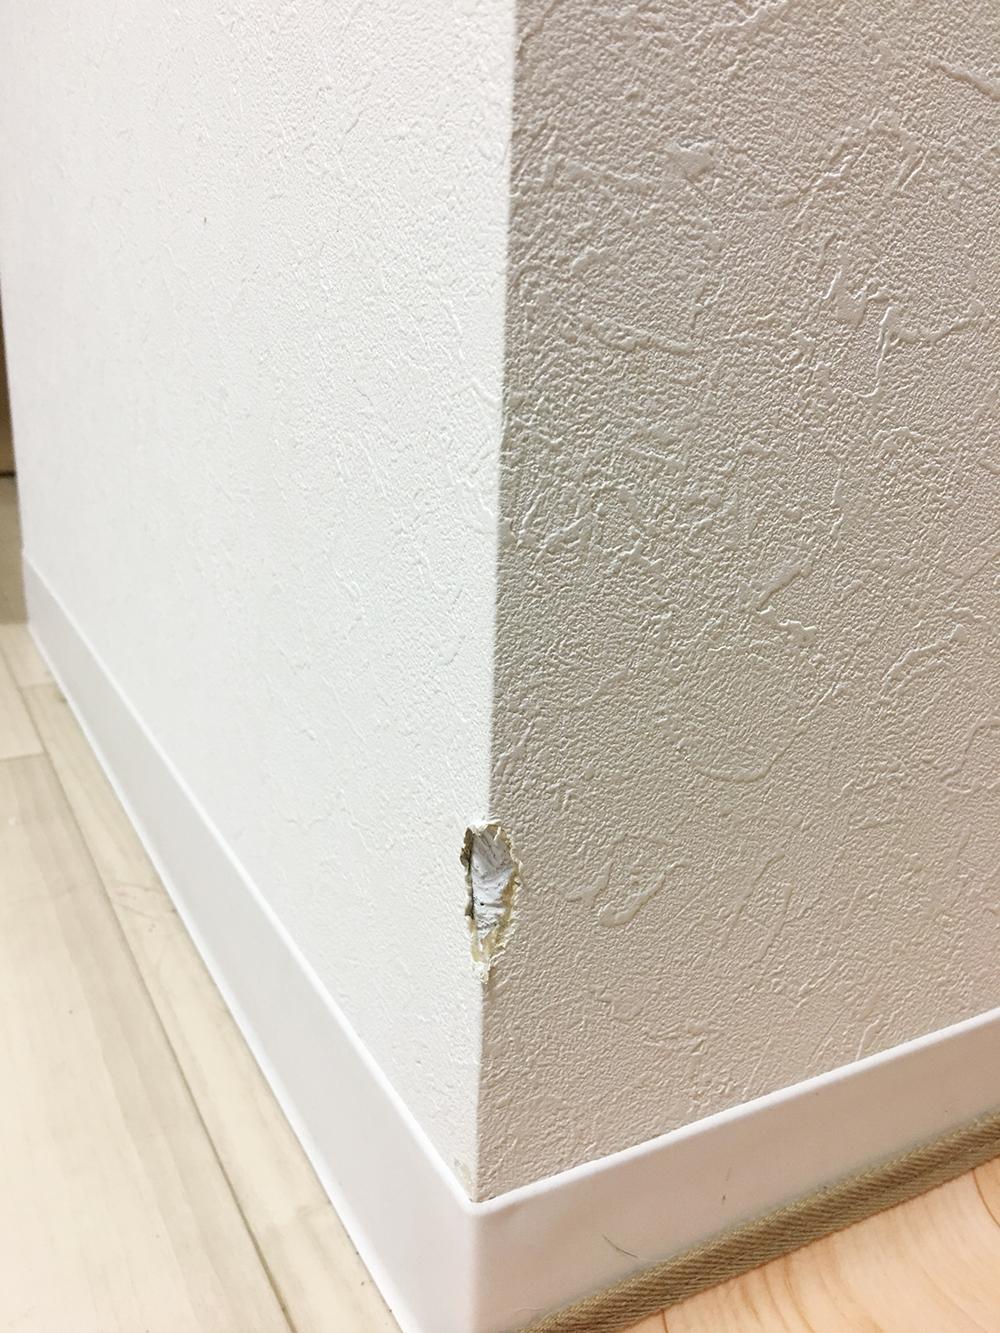 壁の角補修工事